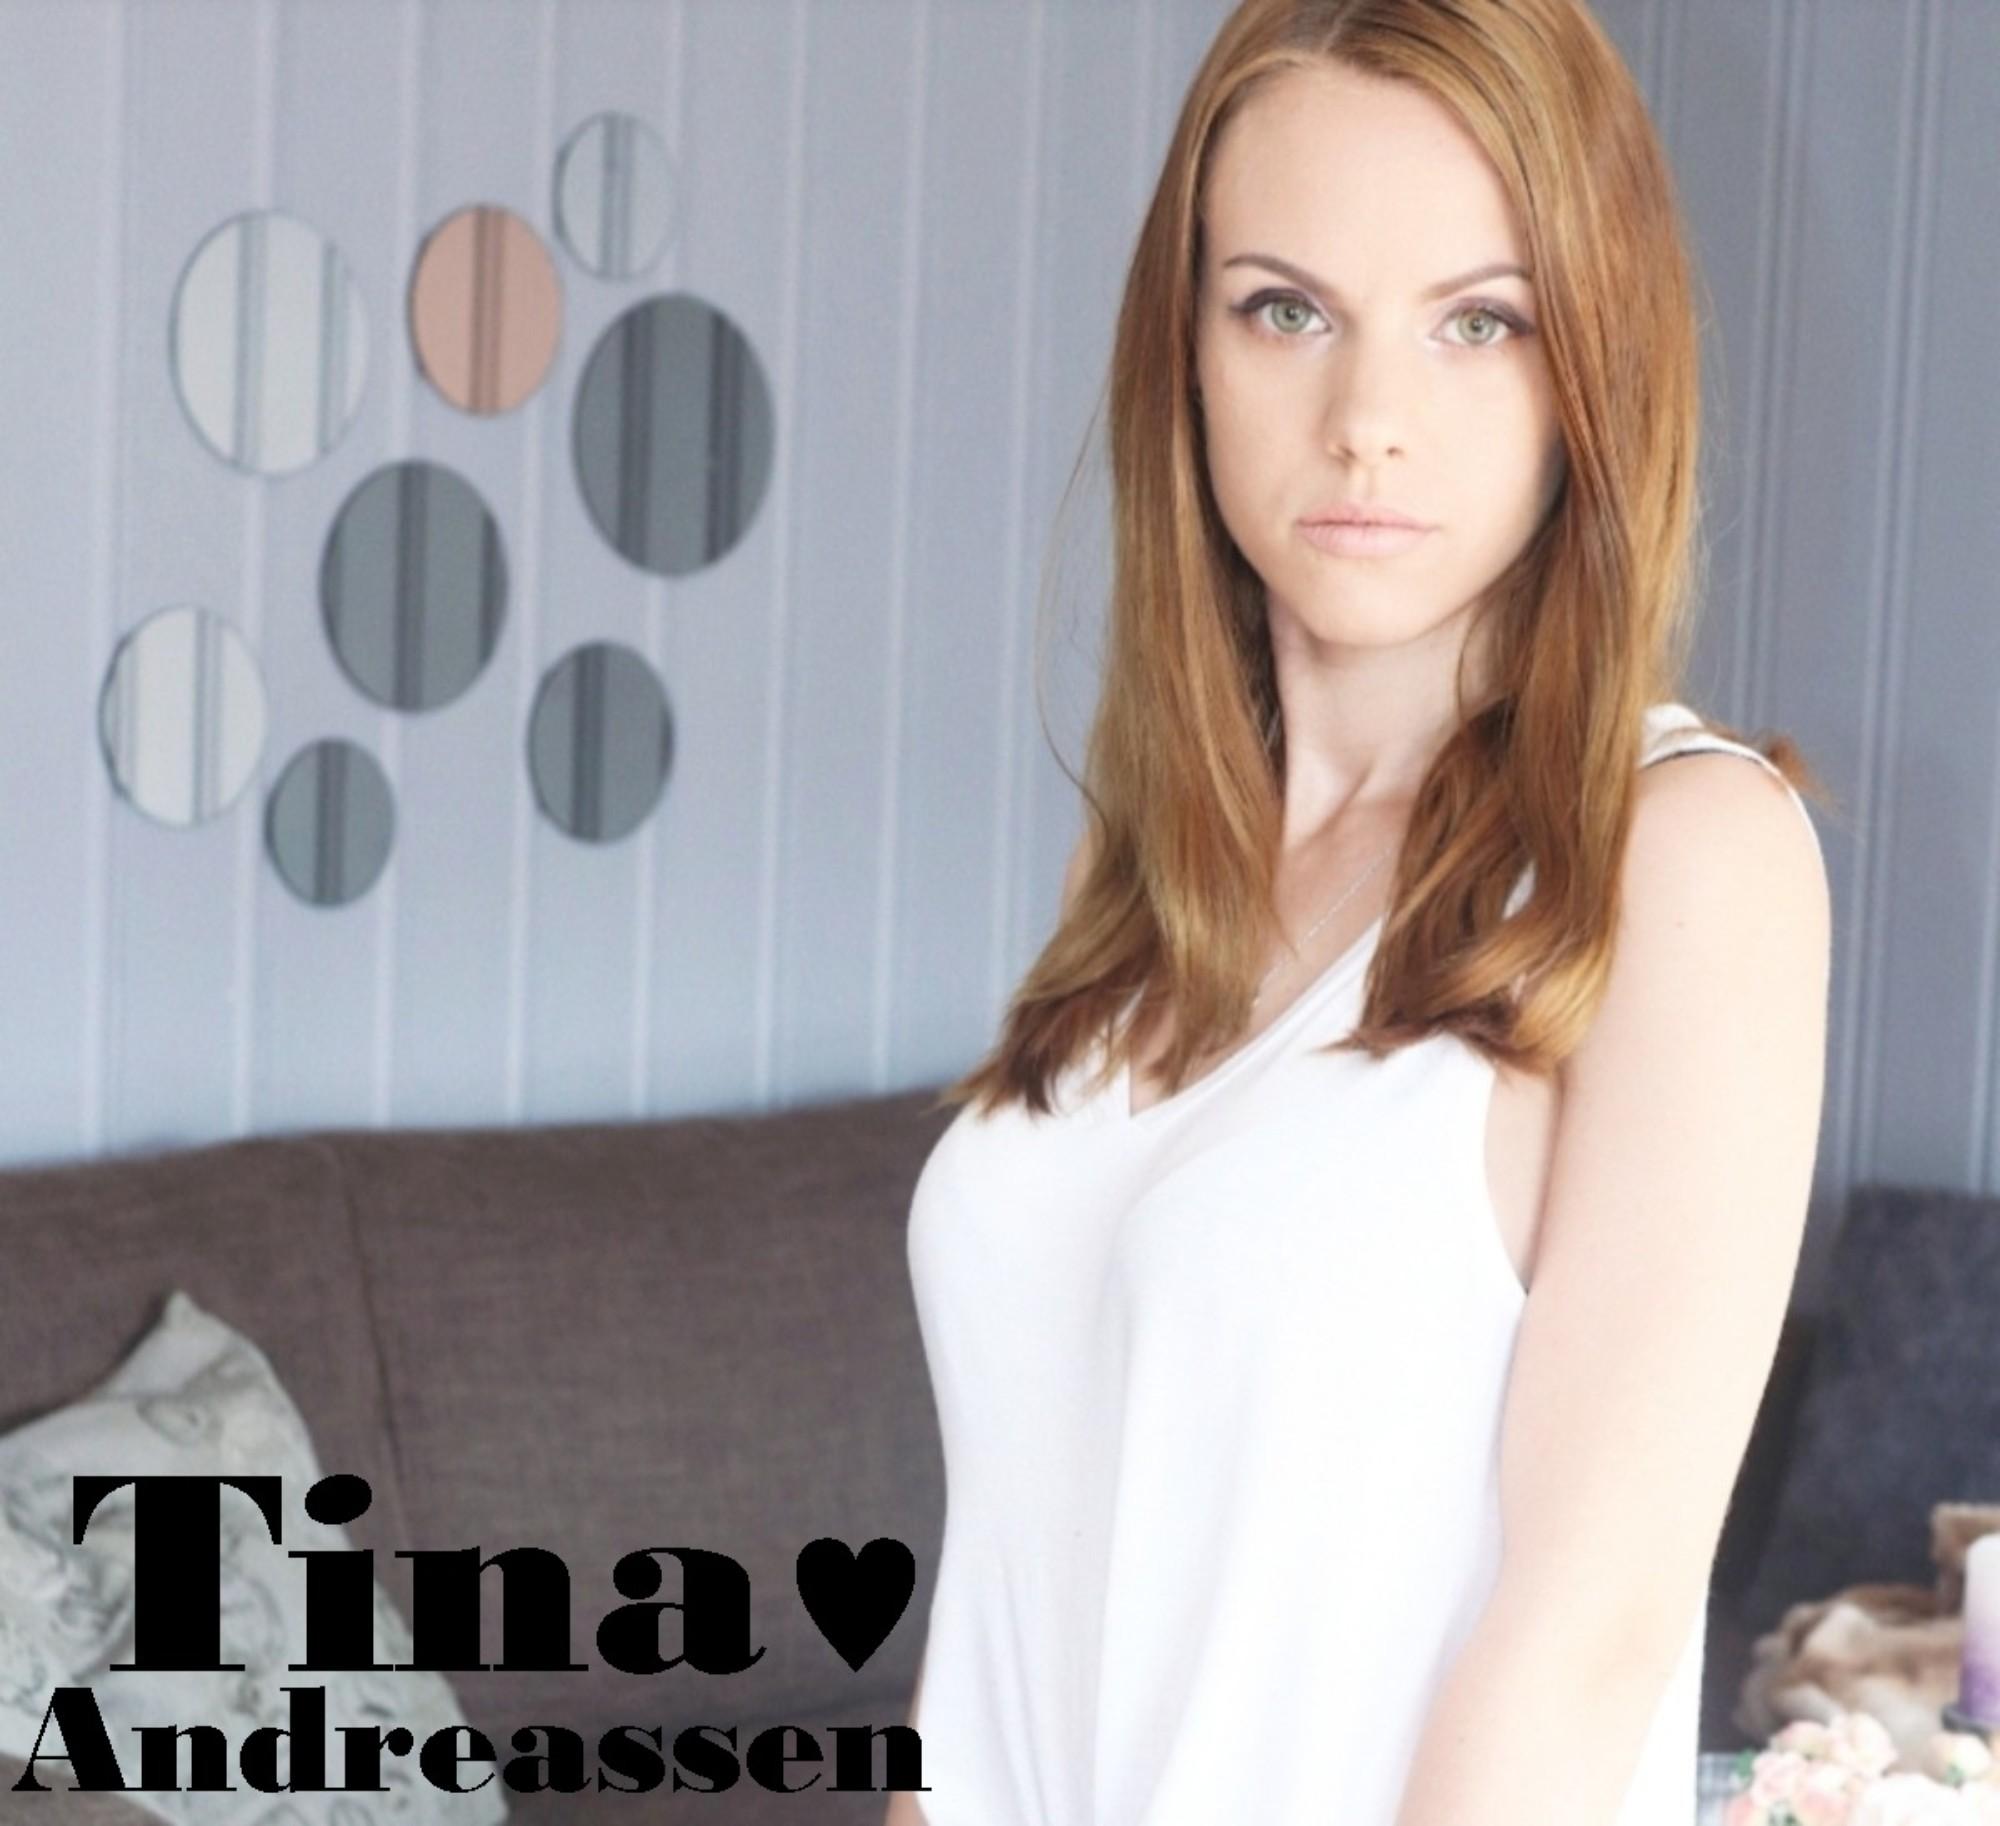 Tina Andreassen